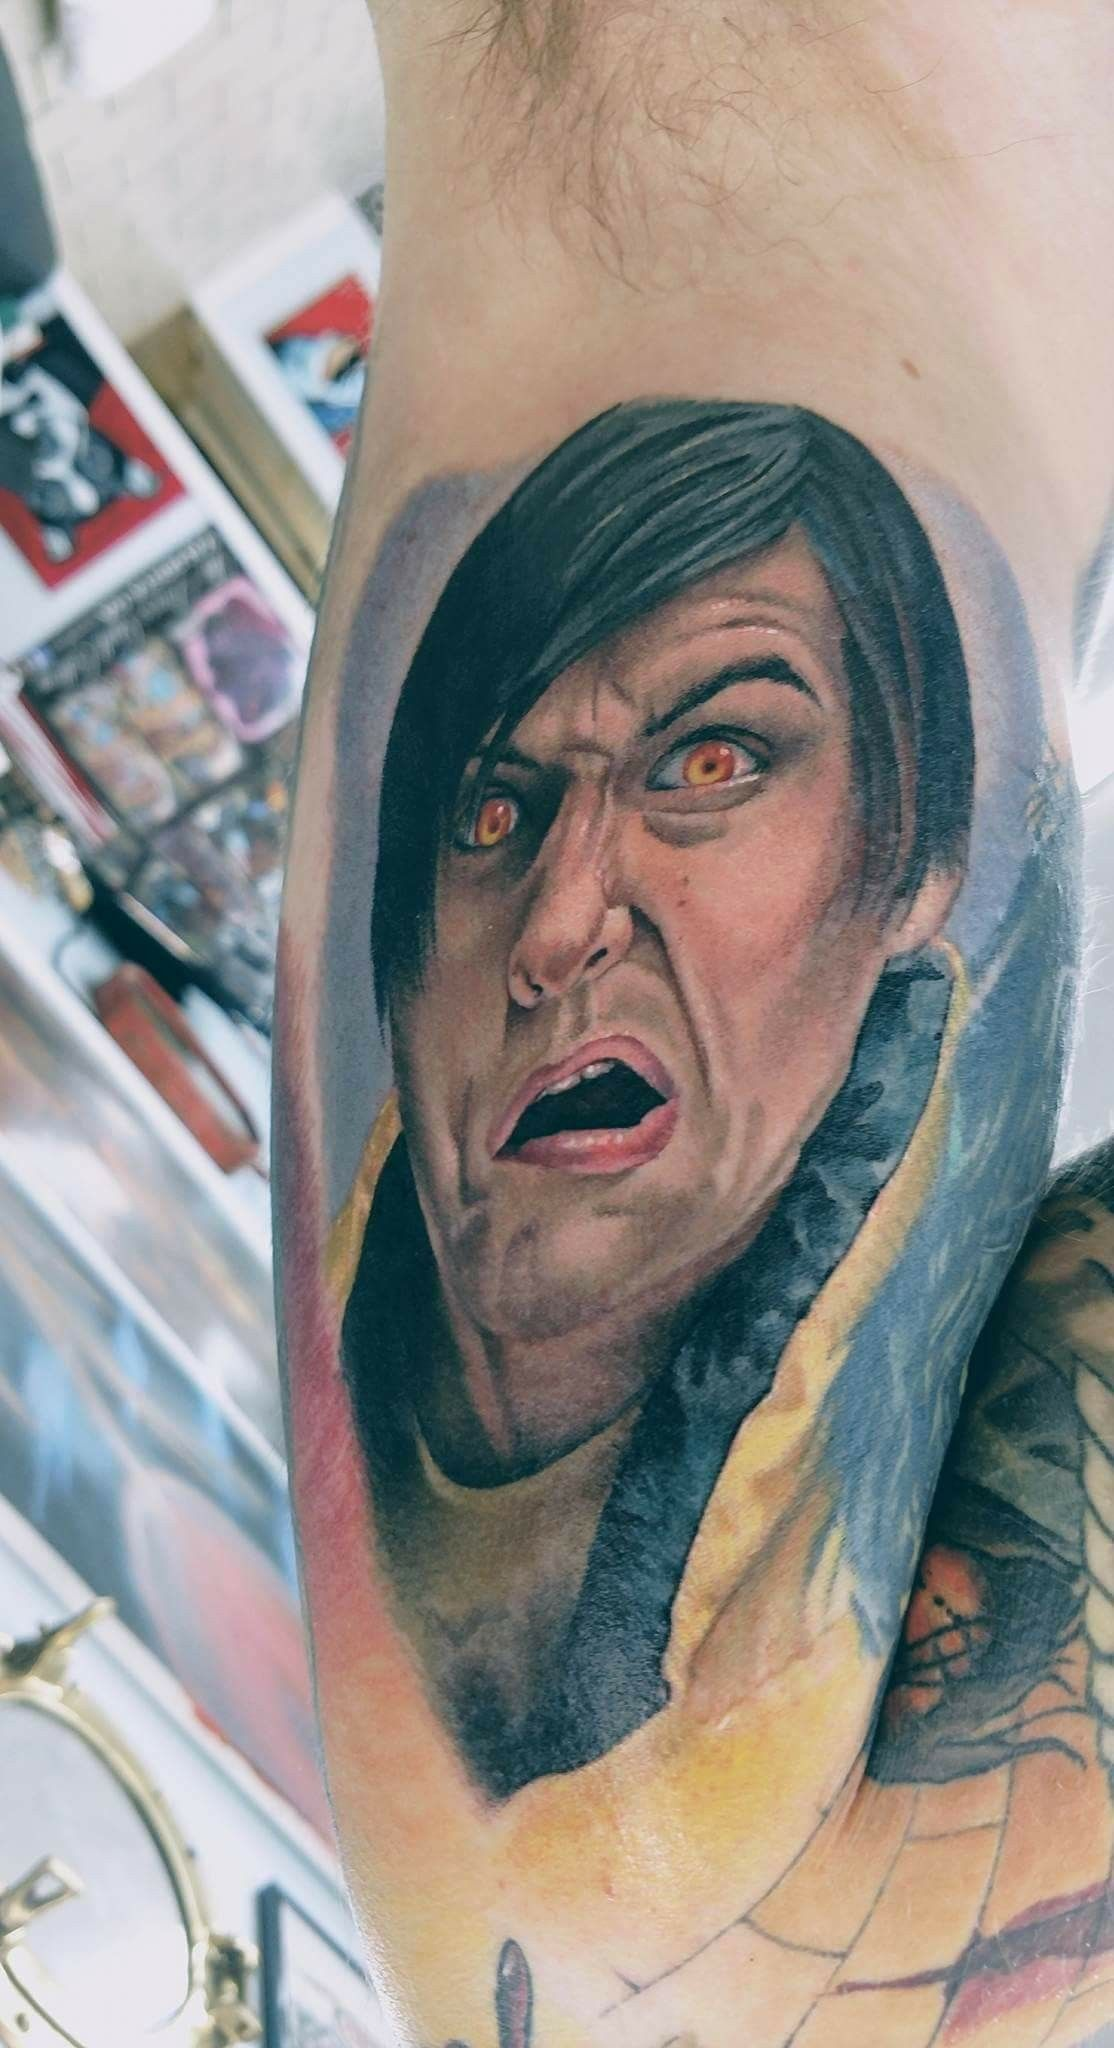 Little Nicky tattoo, Adam sandler, get in the flask tattoo, movie tattoo,  realist horror movie, comedy movie tattoo, little nicky, little Nicky ink,  little ...